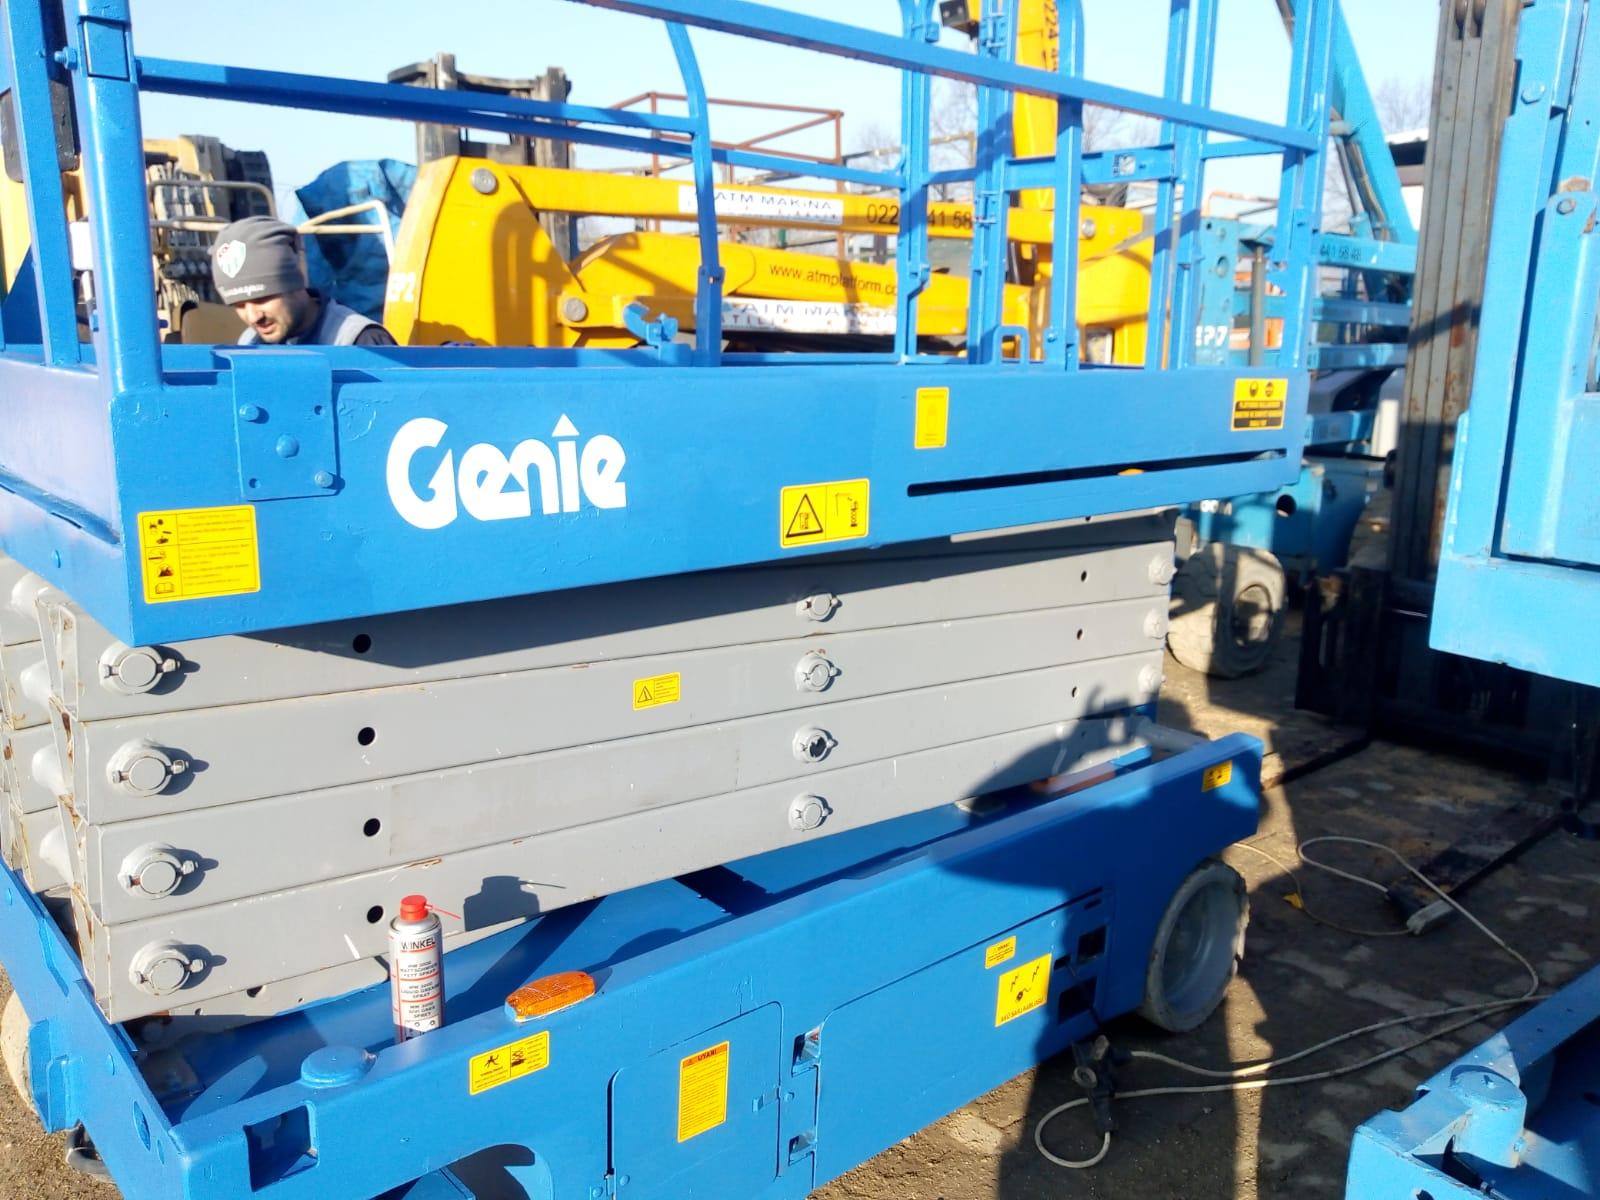 Genie Platform MANLİFT  12 M full bakımlı